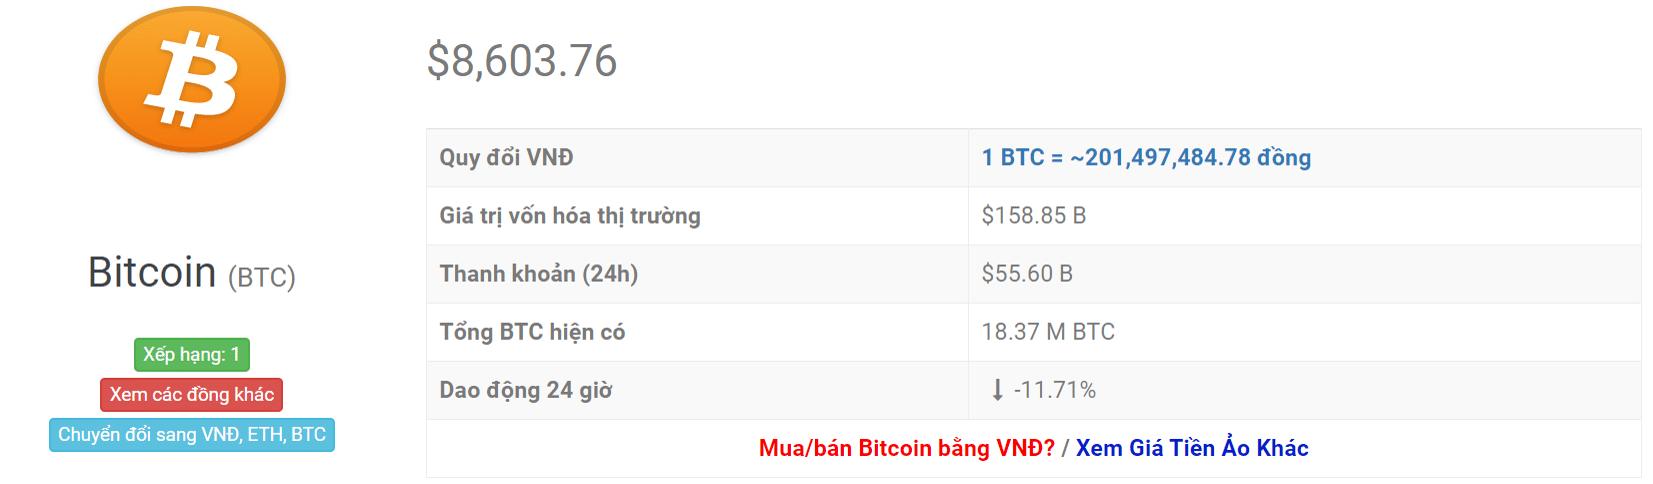 tỷ giá btc